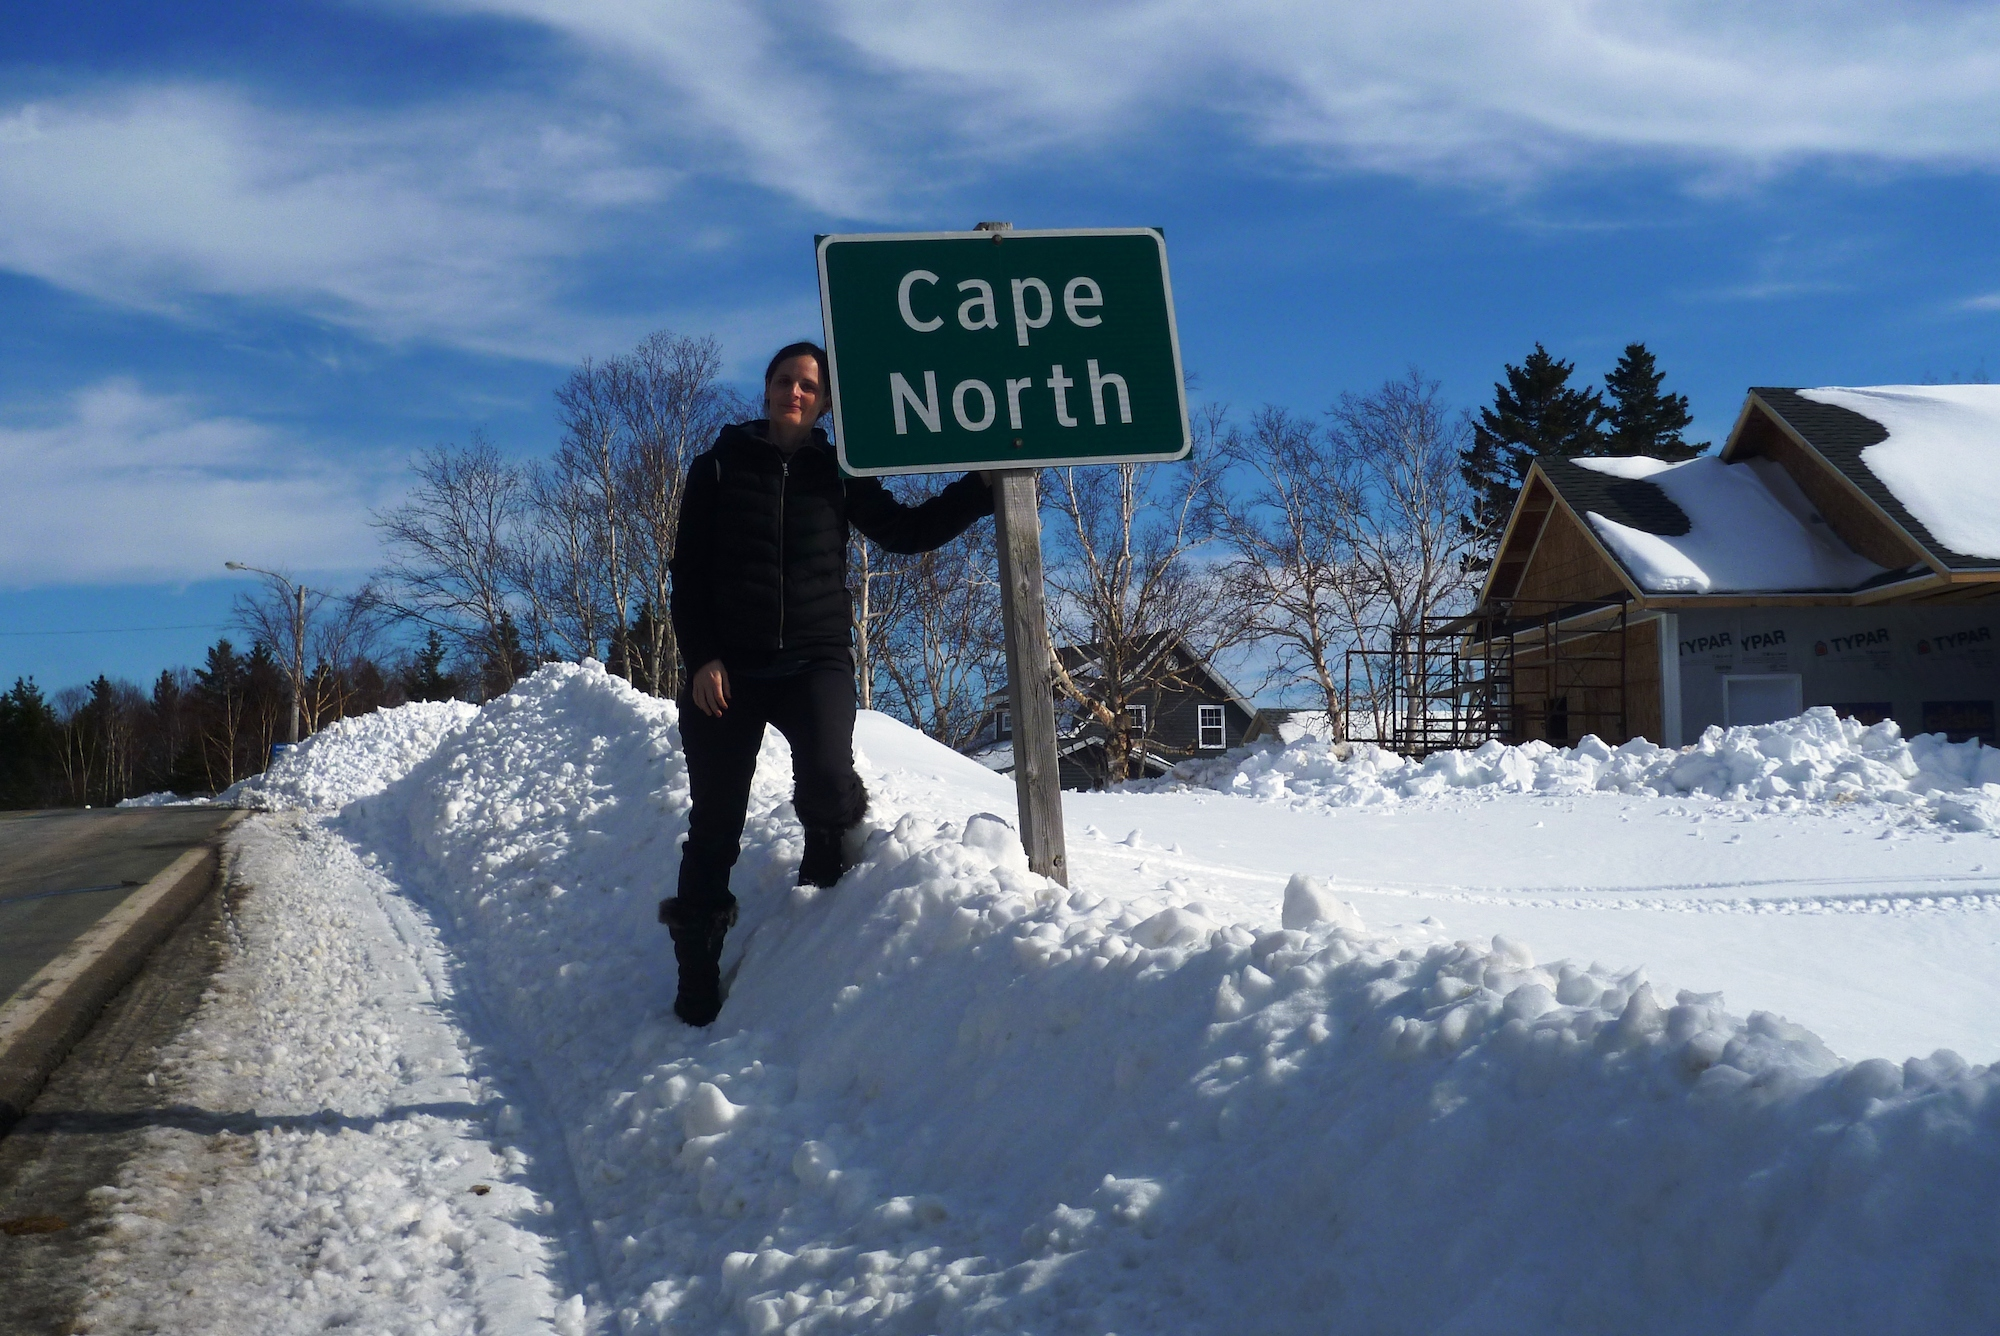 Hiver au Canada - Cape North, Cabot Trail